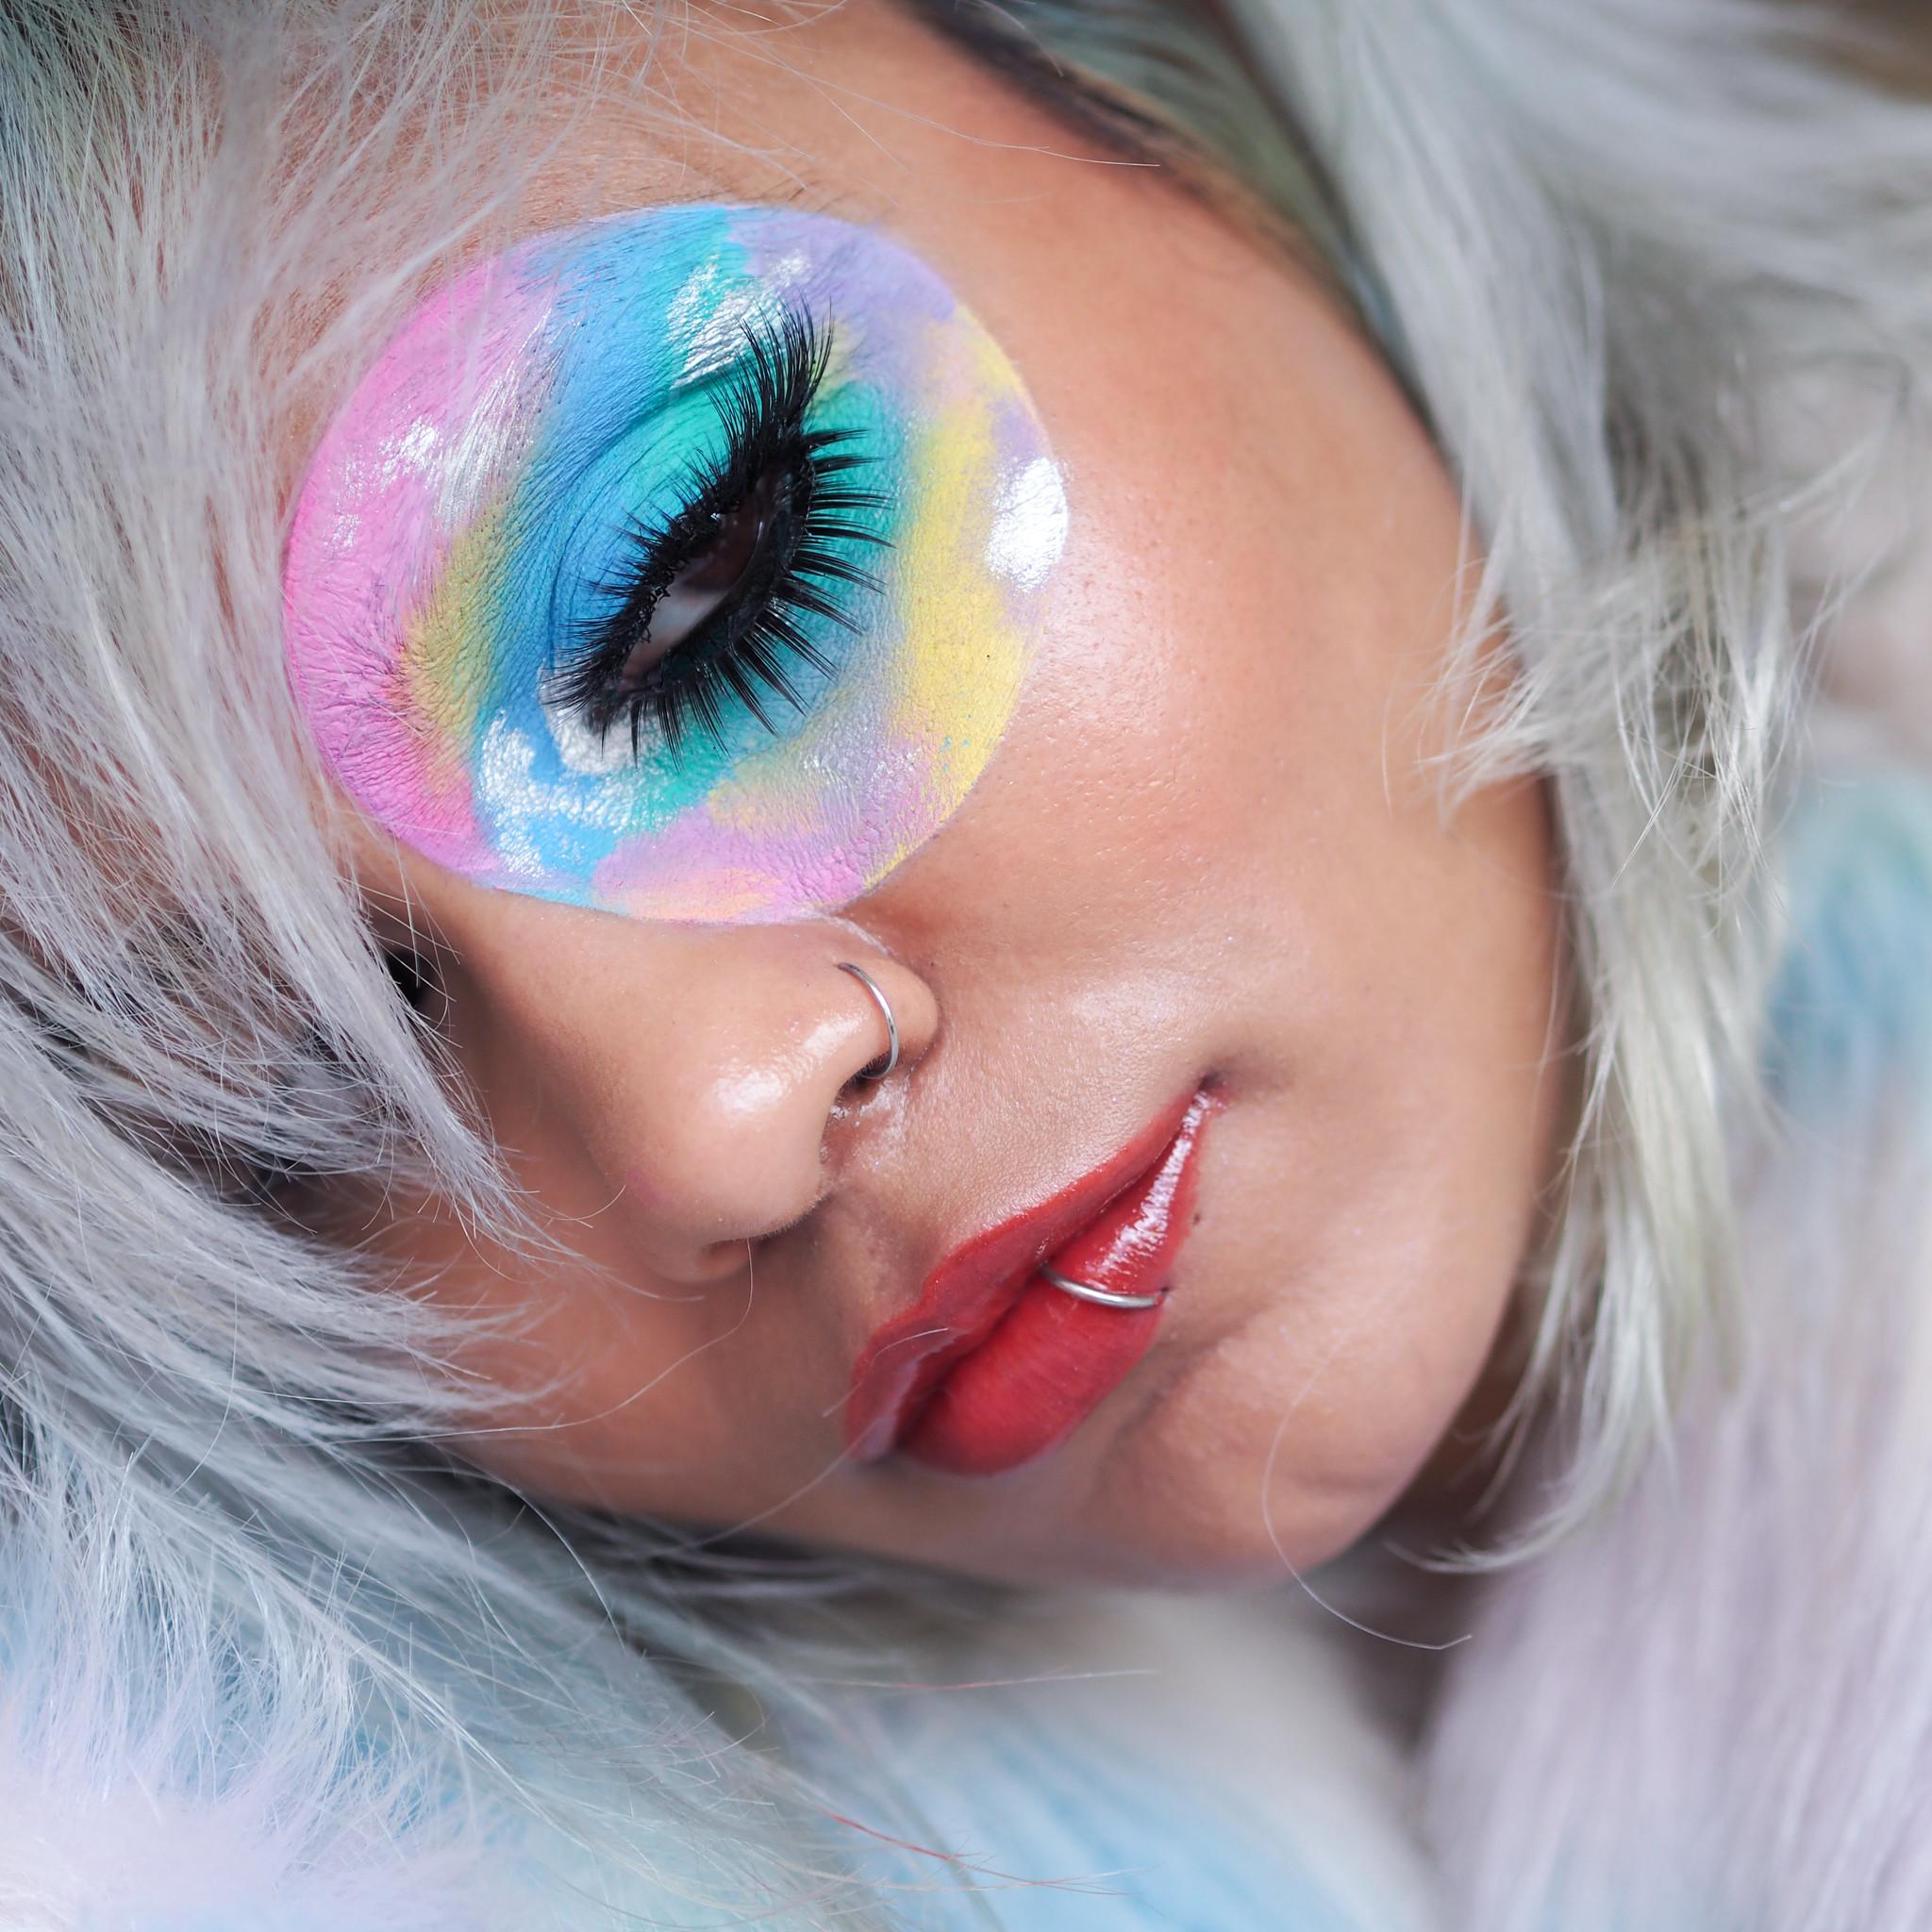 Depixym cosmetic emulsions pigments reviews makeup look